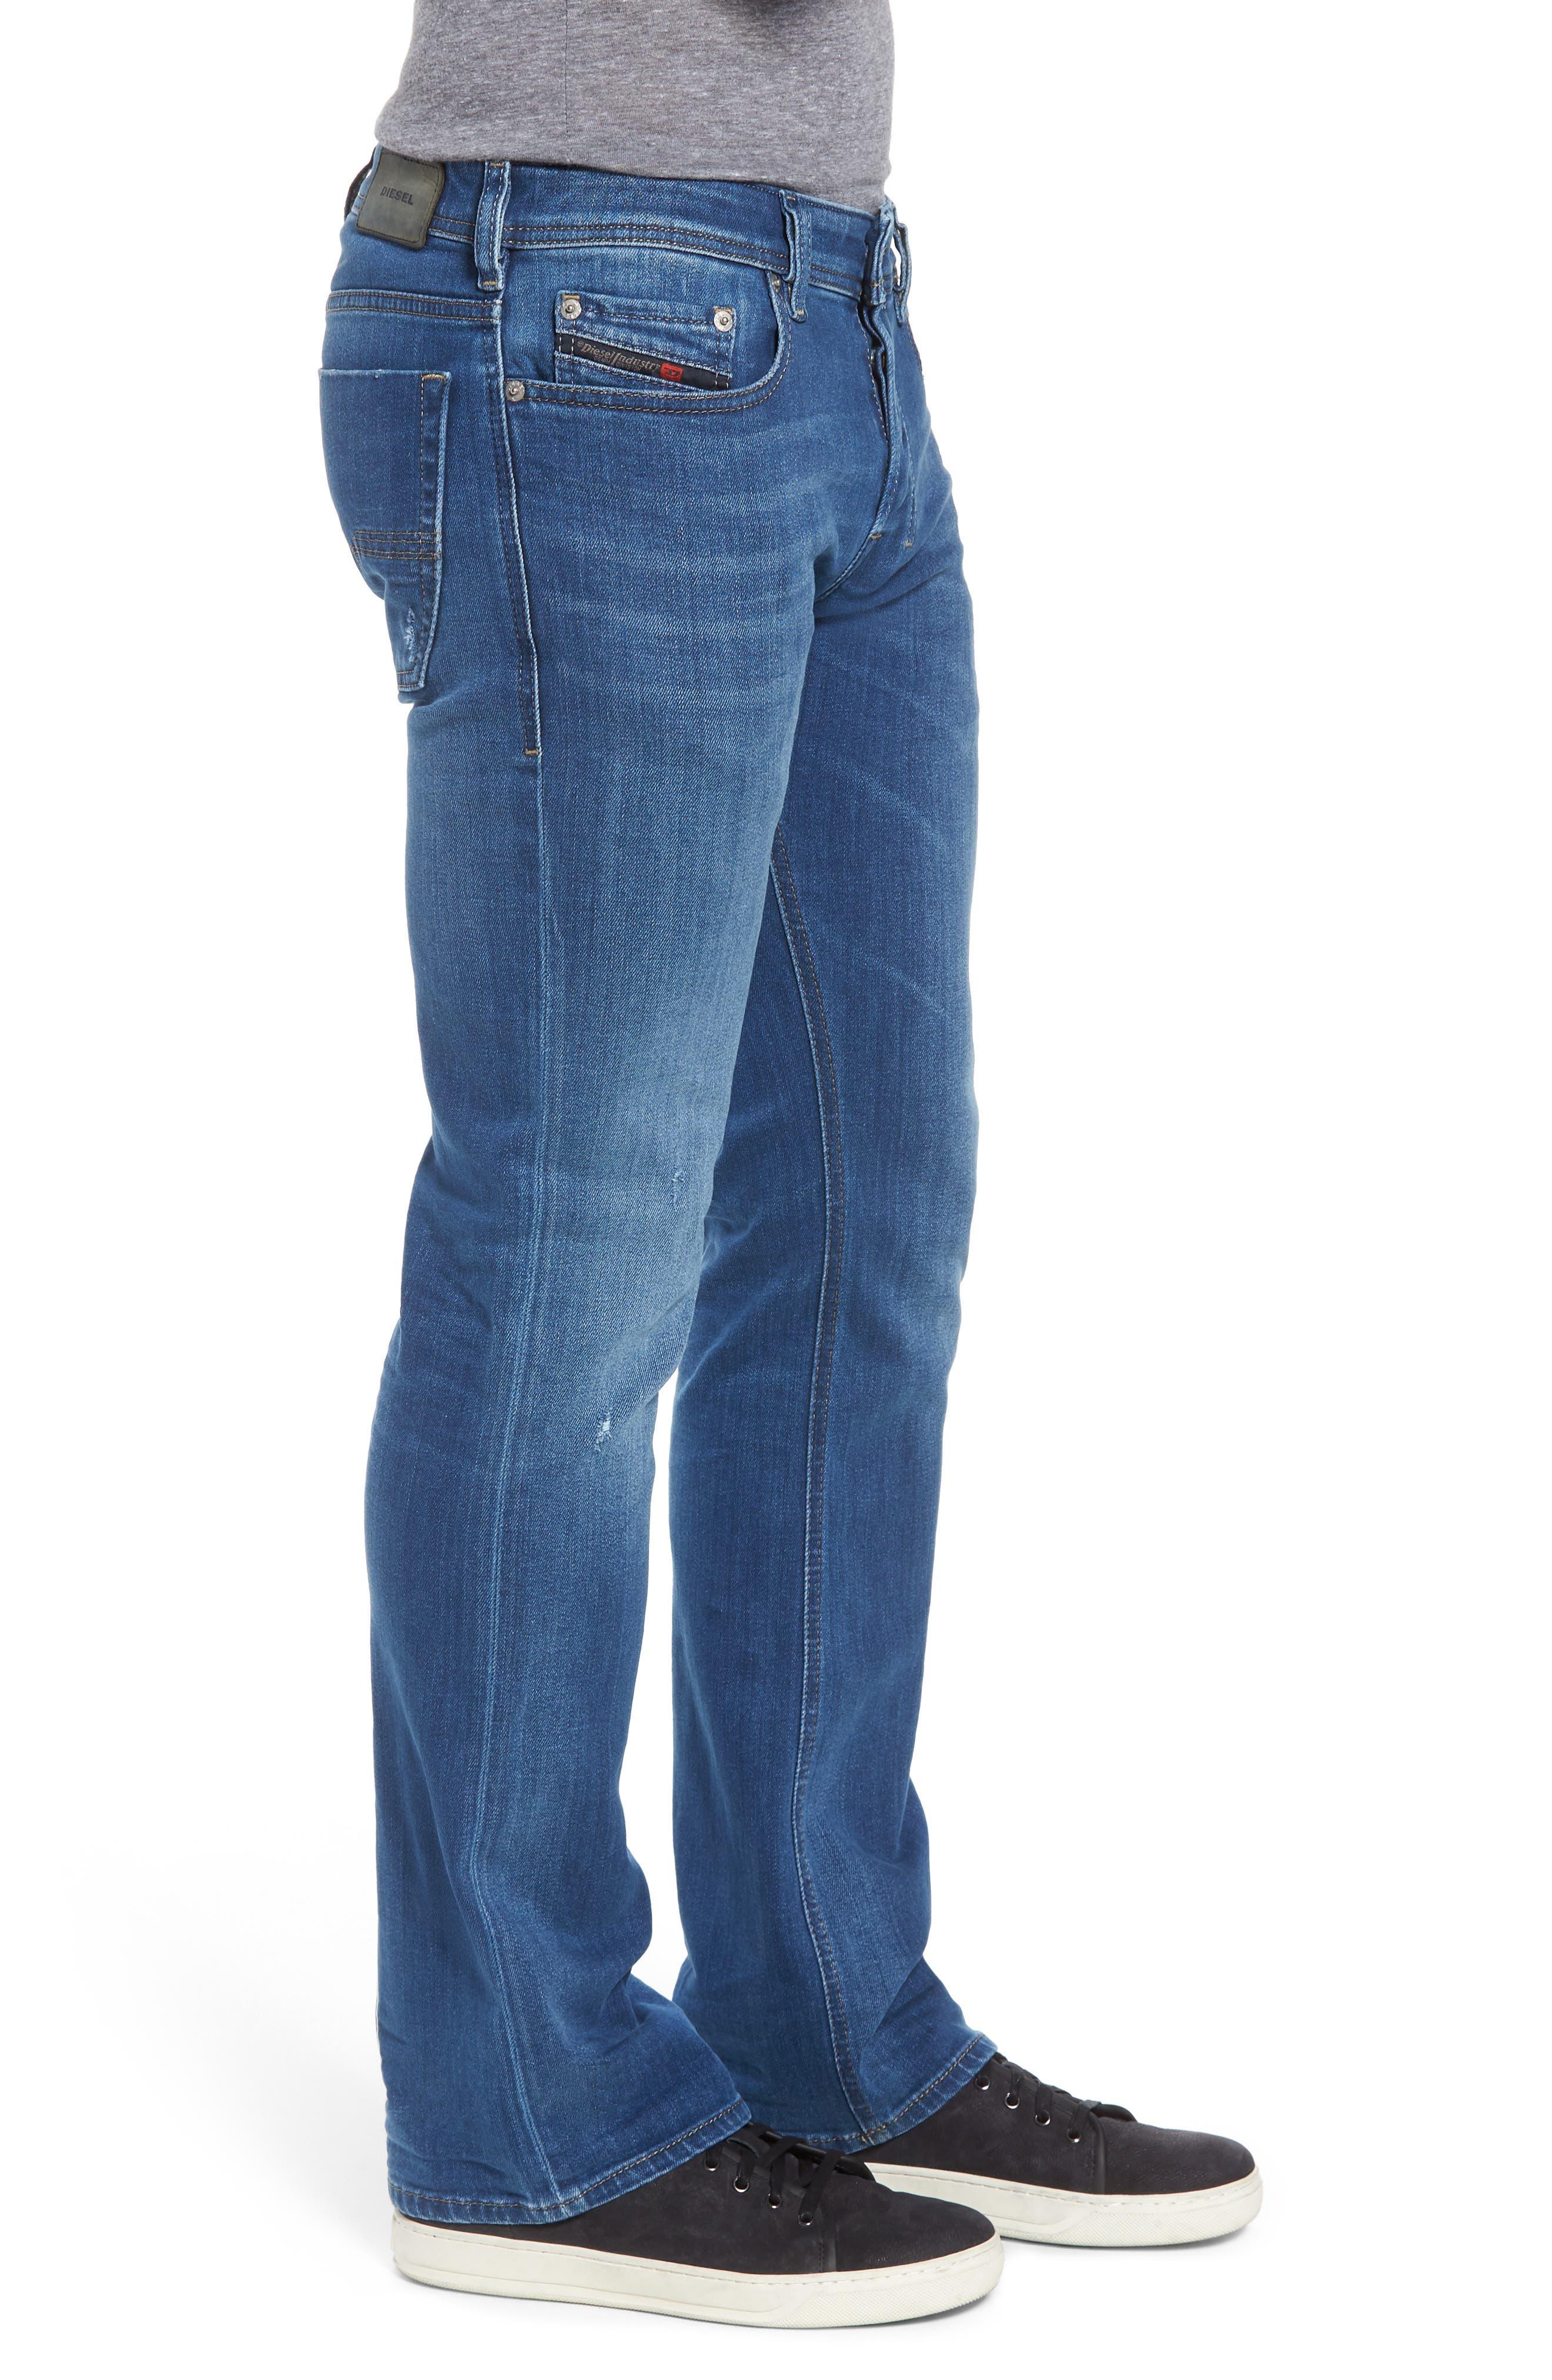 Zatiny Bootcut Jeans,                             Alternate thumbnail 3, color,                             084Qq